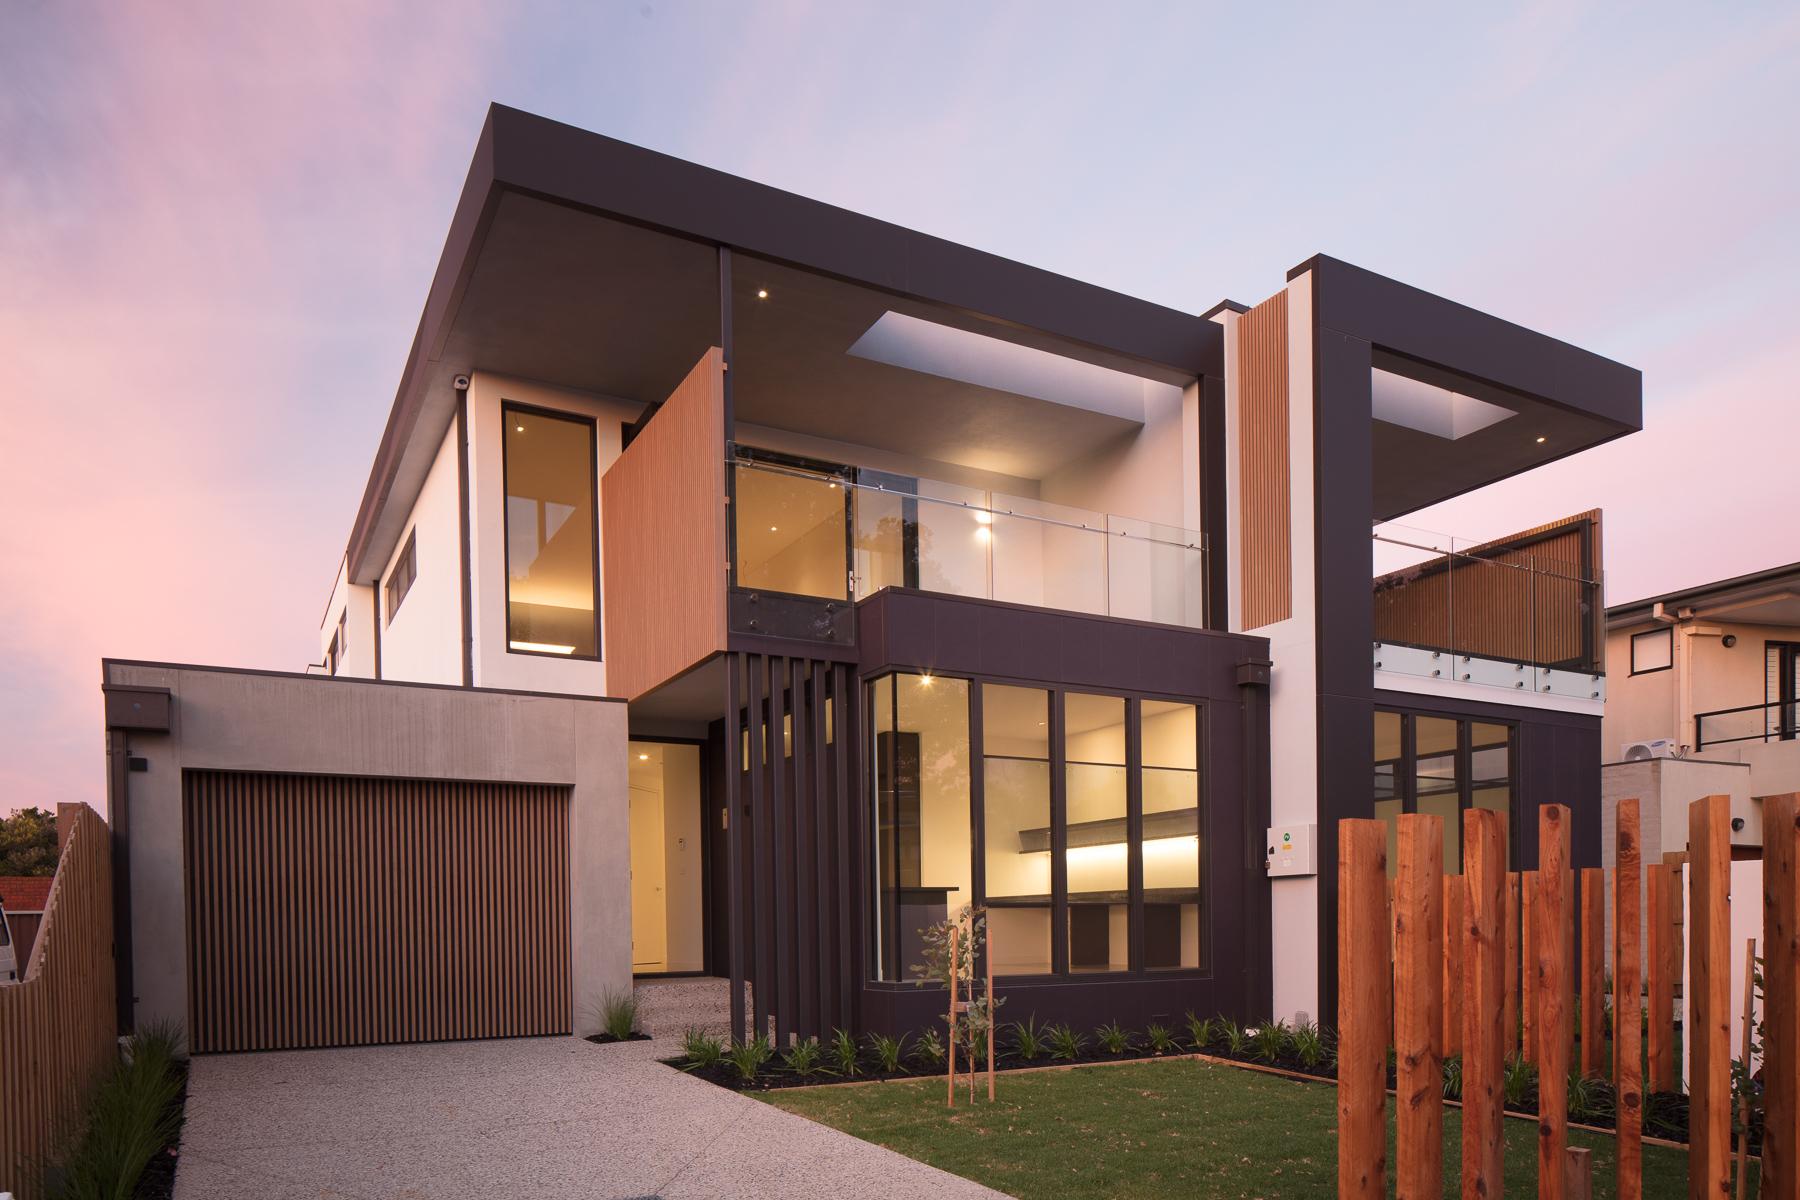 Dual townhouse development - Seaholme VIC Ever Art Wood® battens - Kabebari 30x50 to garage doors; Doubuchi prefabricated screen cladding.